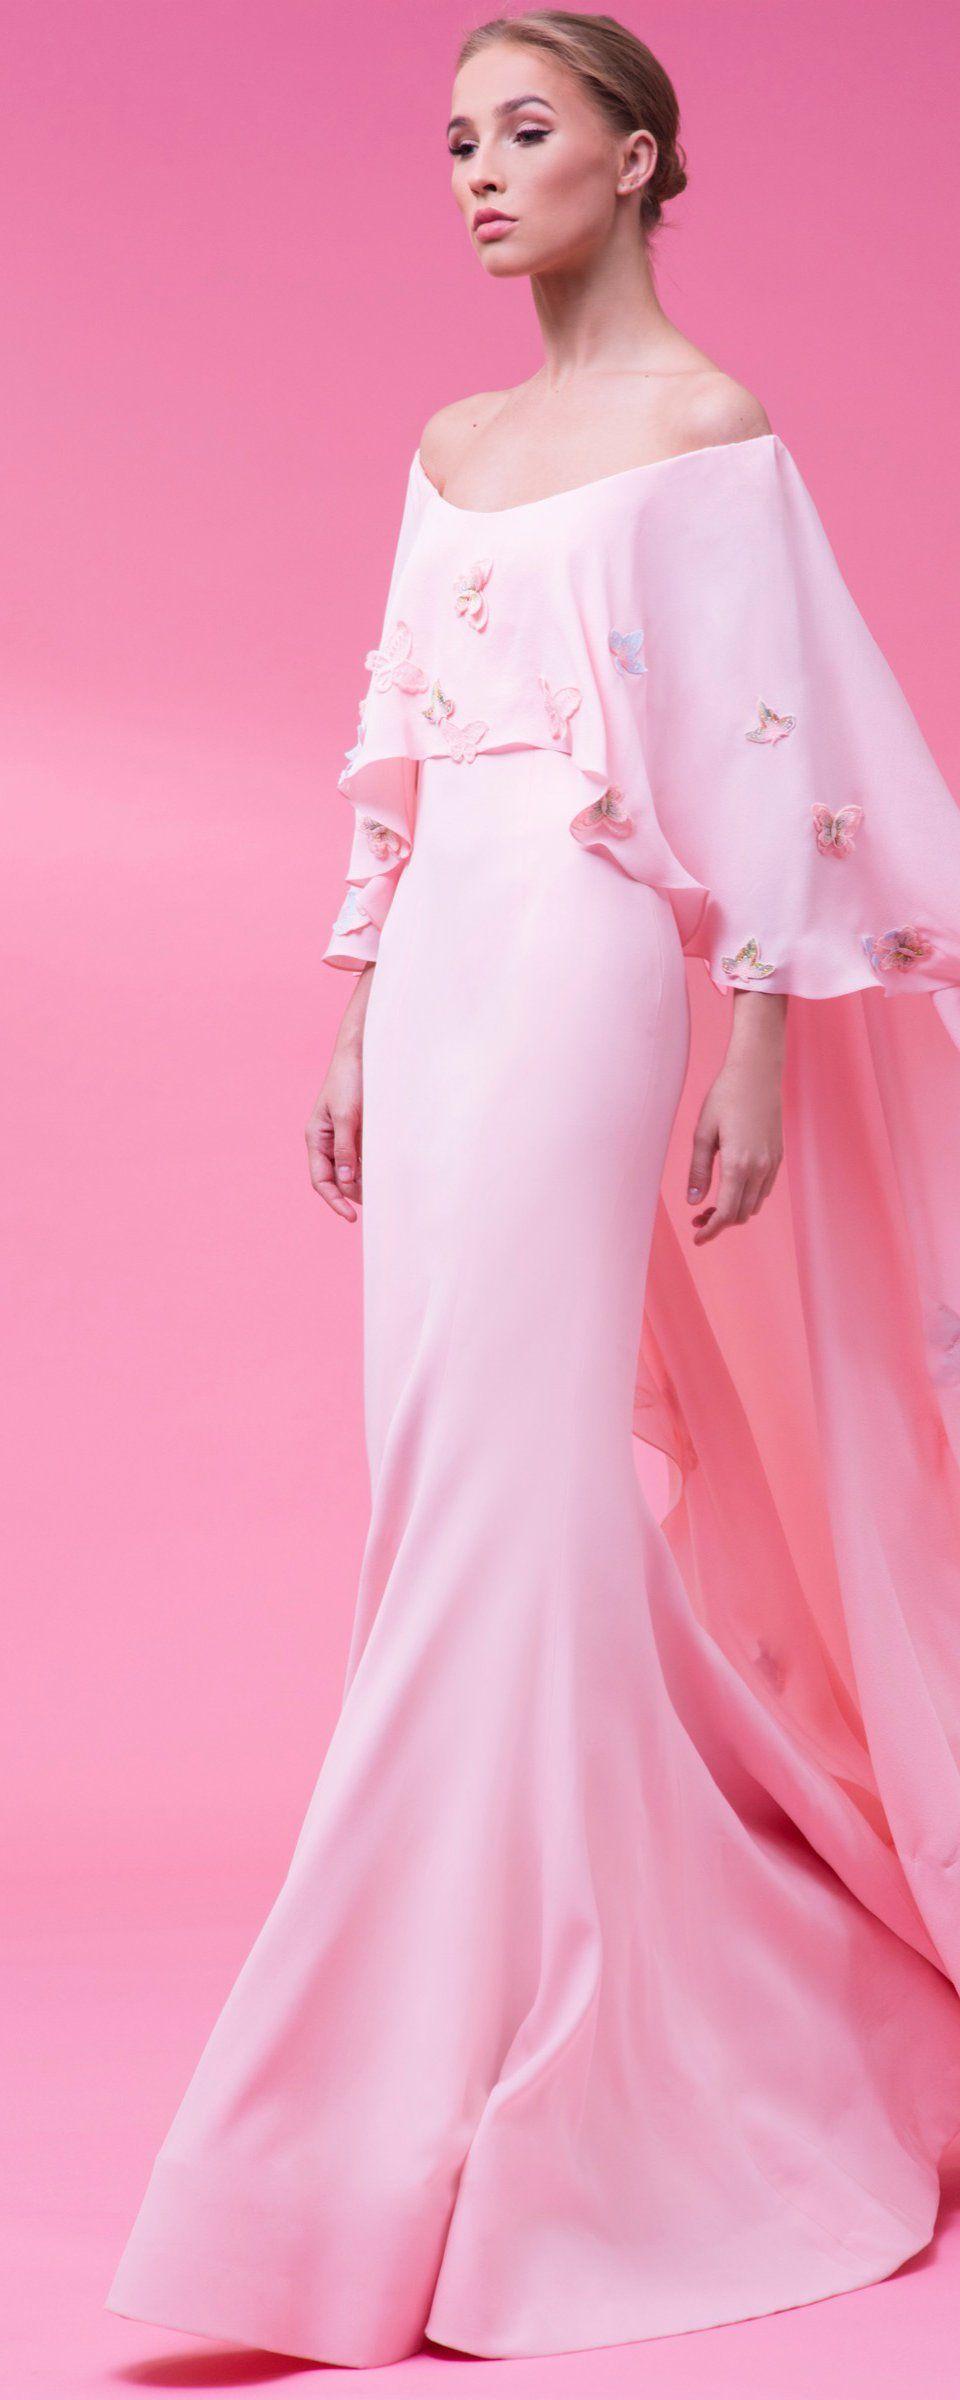 Rani Zakhem Primavera-Verano 2017 - Pret a porter | Moda rosada y ...